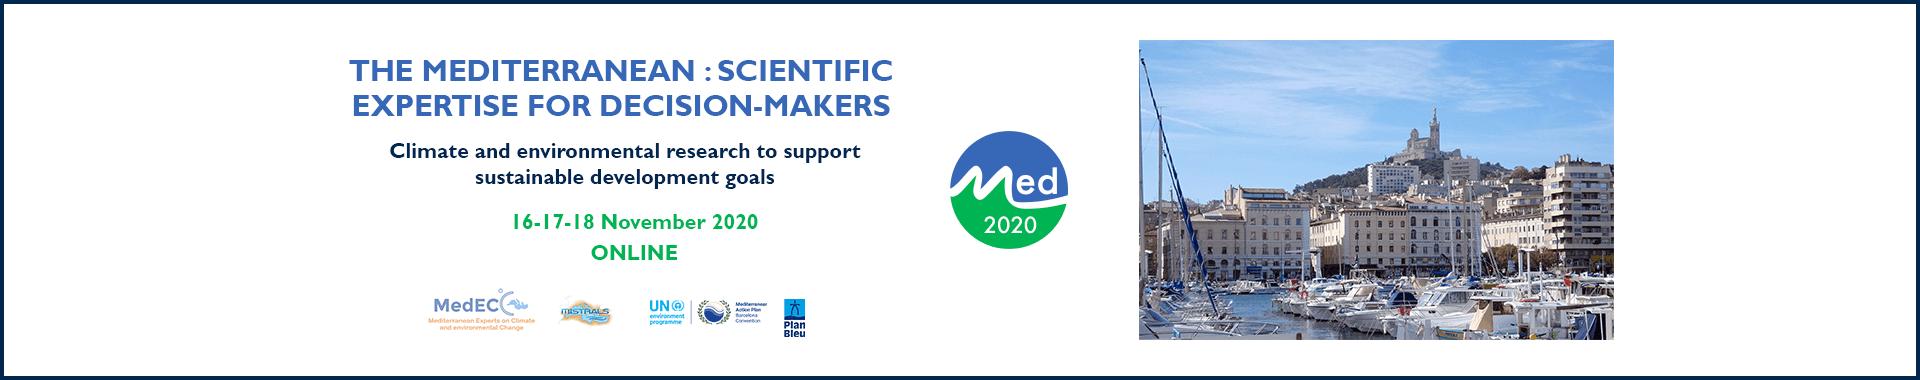 MED2020 Banner